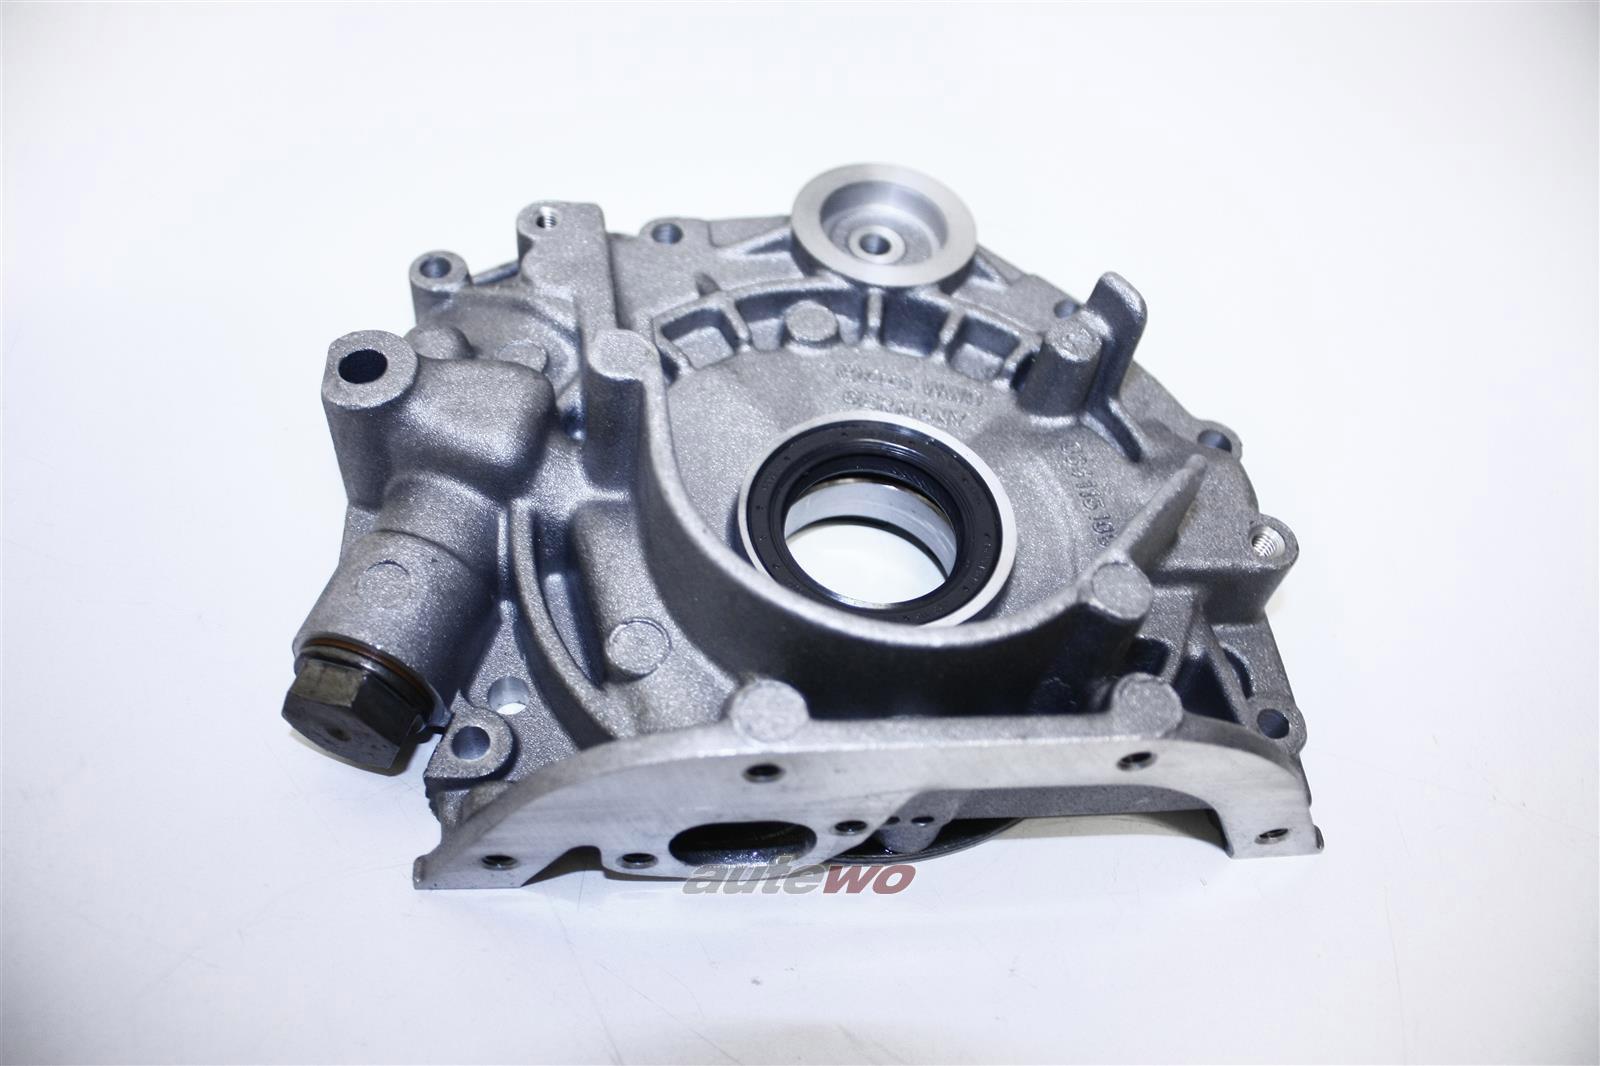 034115105B NEU Audi Urquattro/S2/90 Typ 81/85/100/200 Typ 44 5 Zyl. Ölpumpe